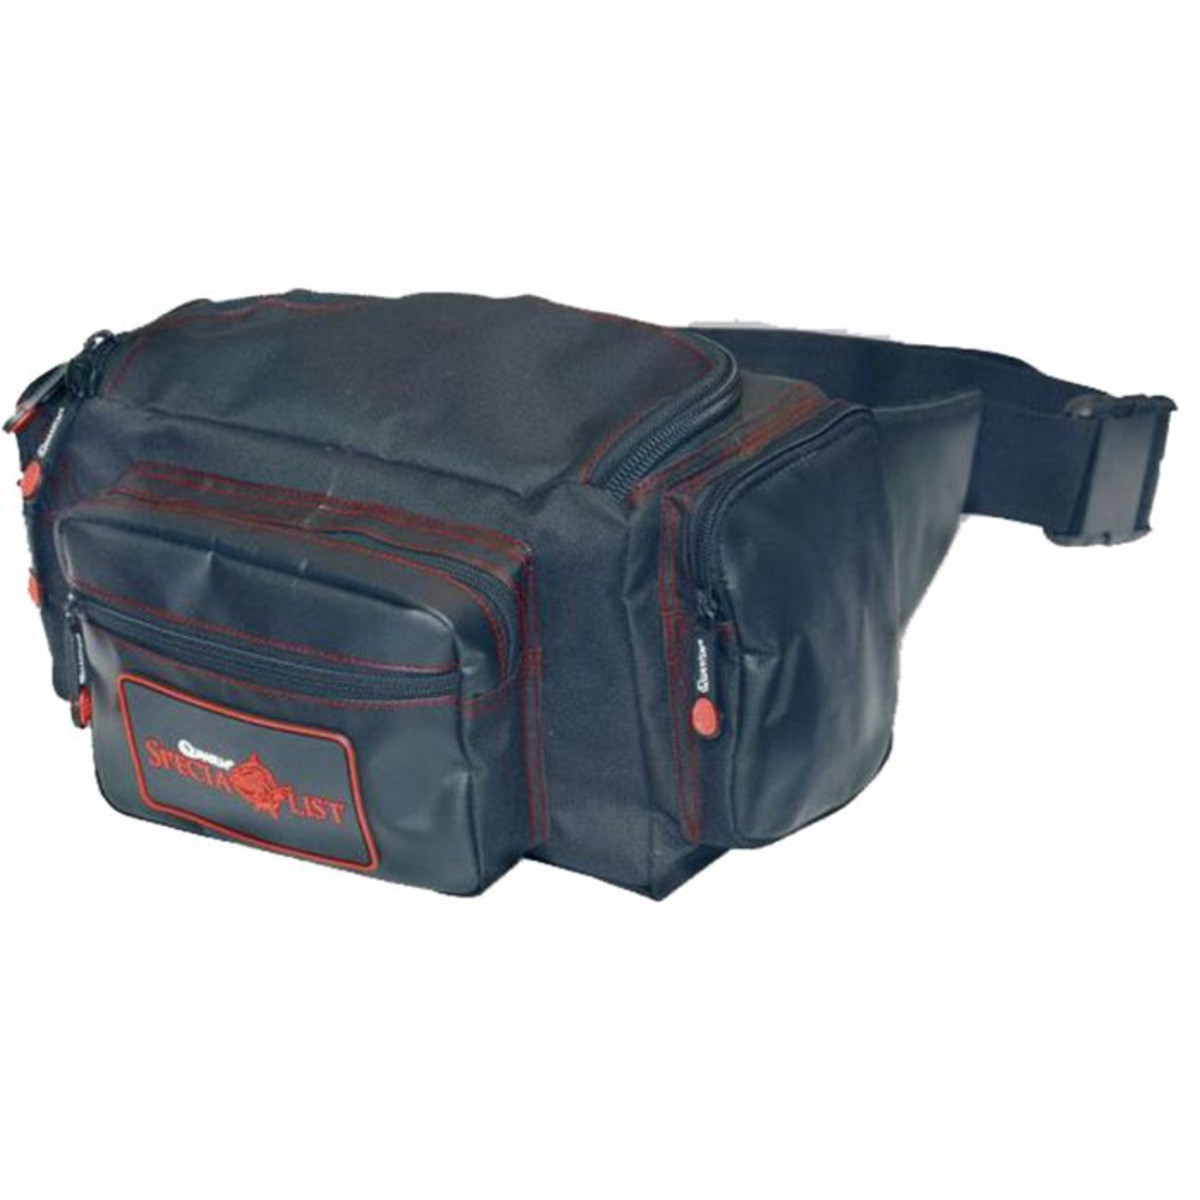 Quantum Specialist Belly Bag - 22 cm x 12 cm x 16 cm